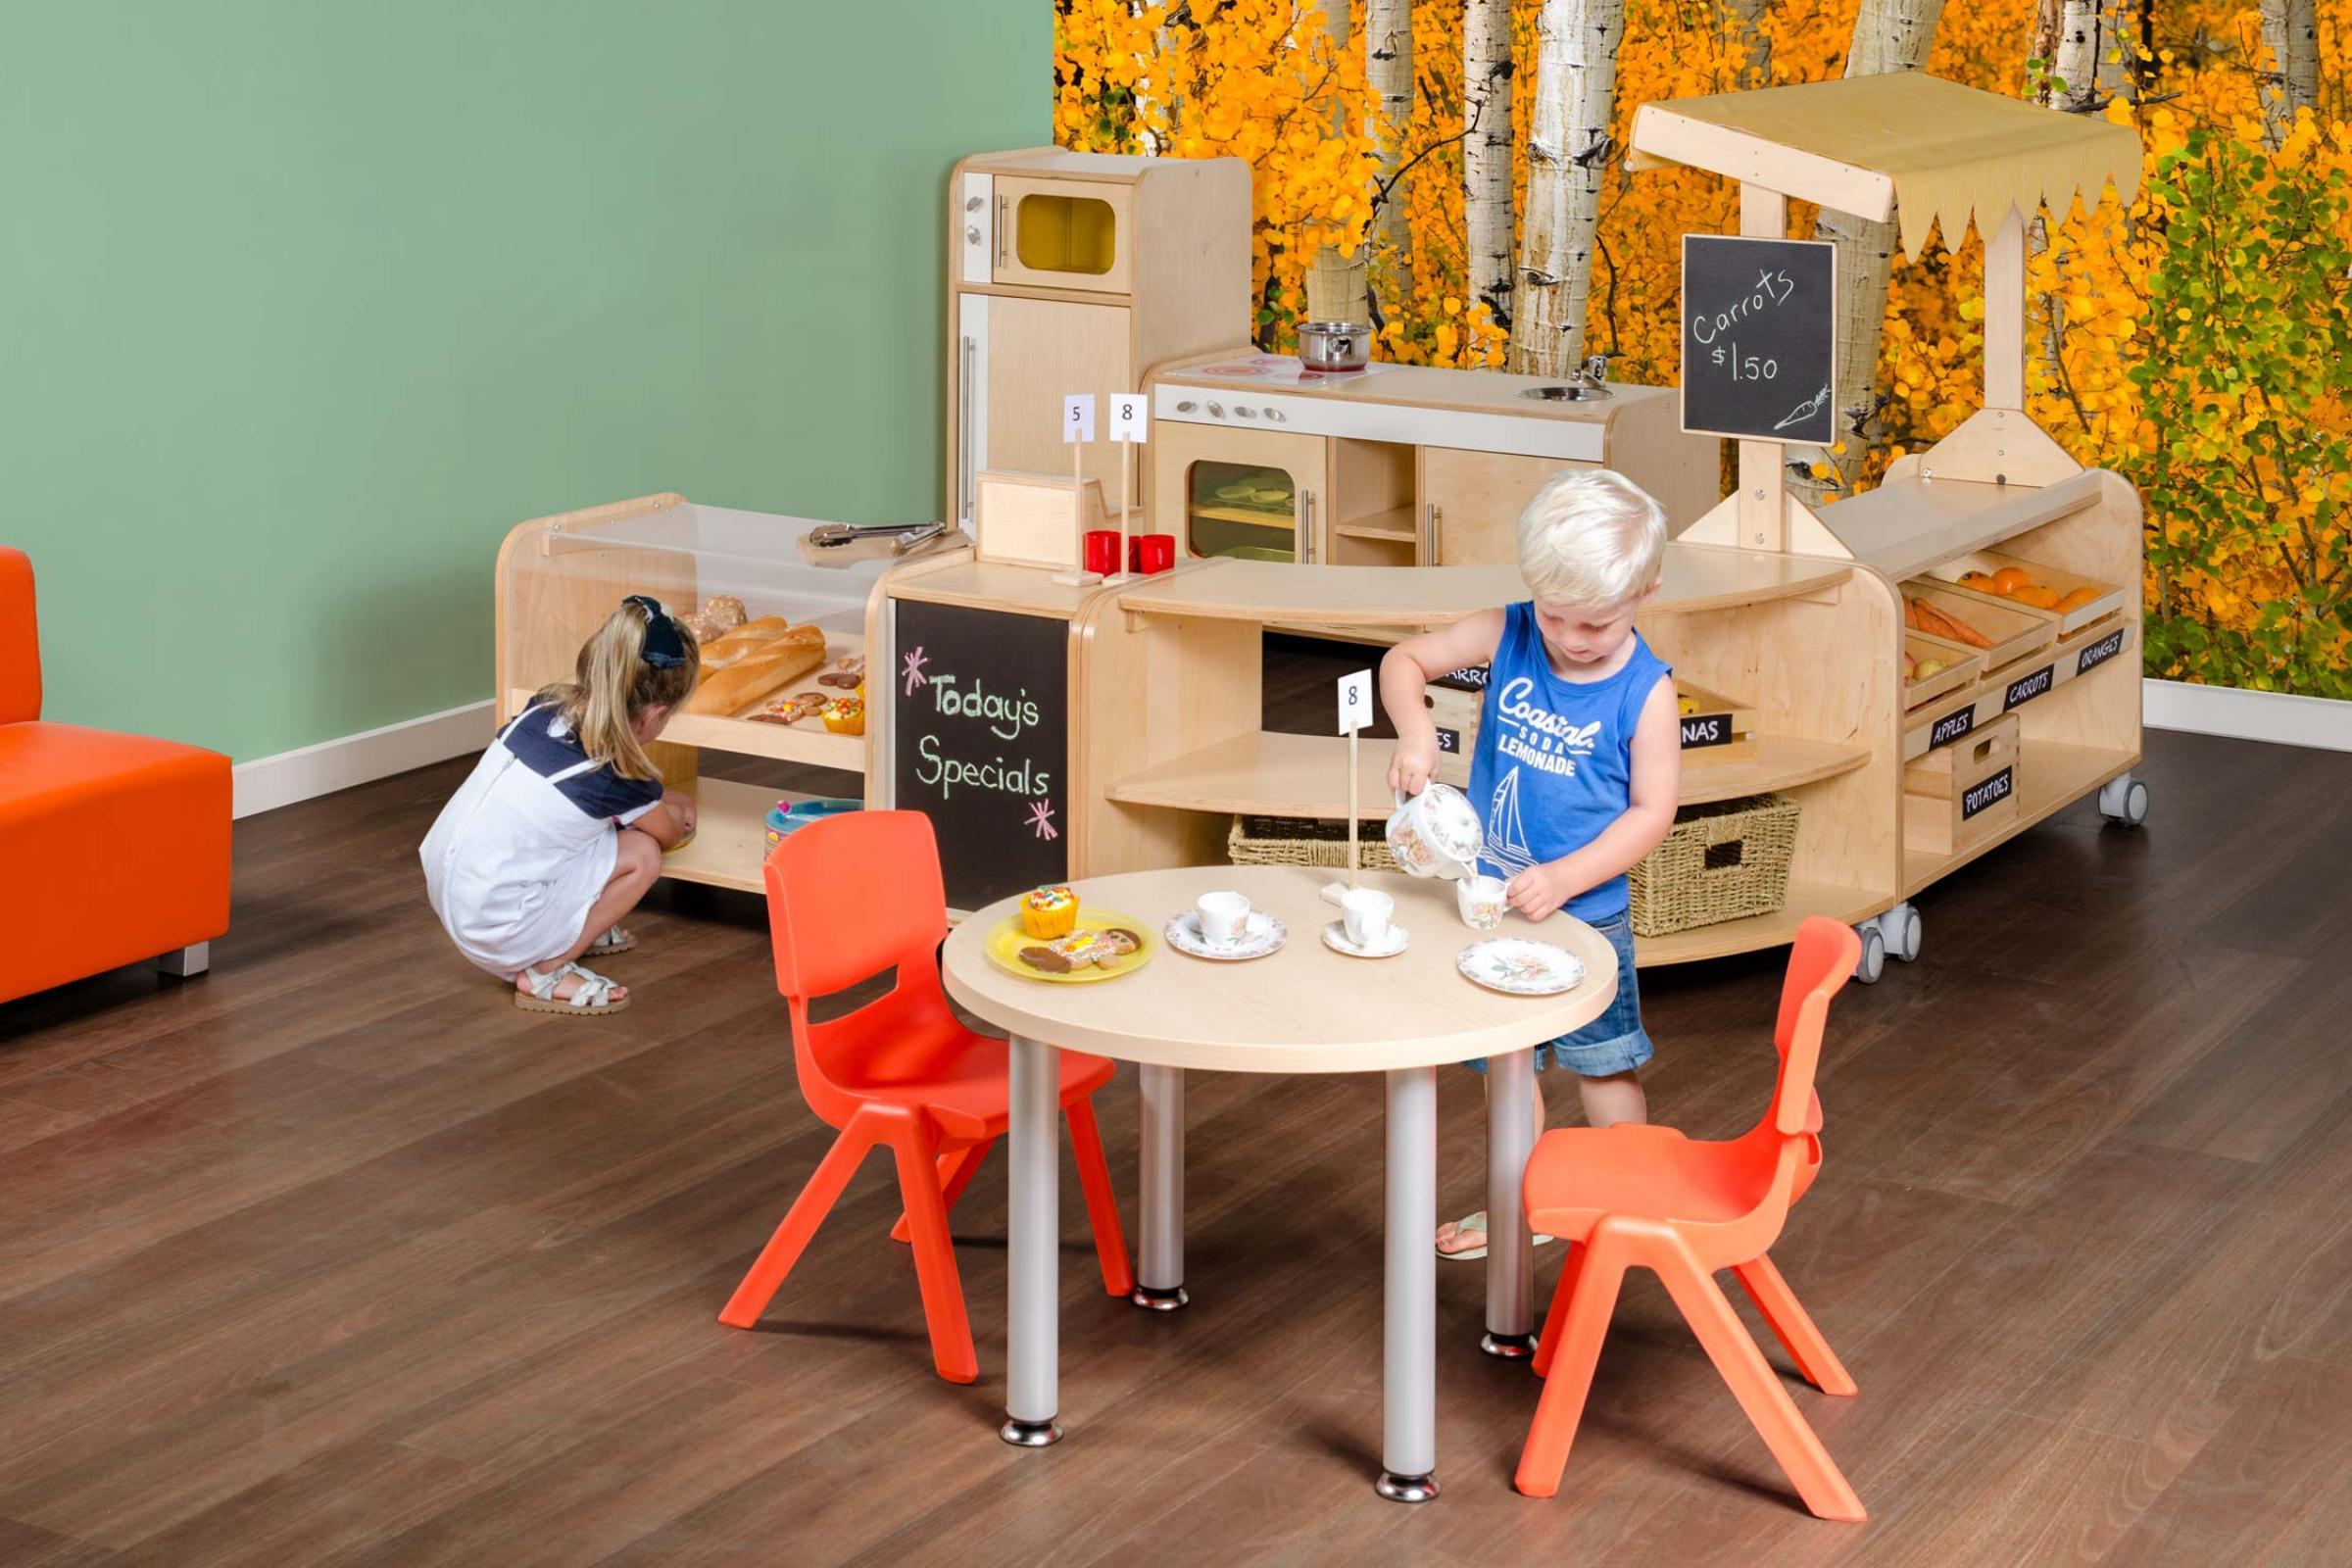 GCMP13-cafe-package.jpg